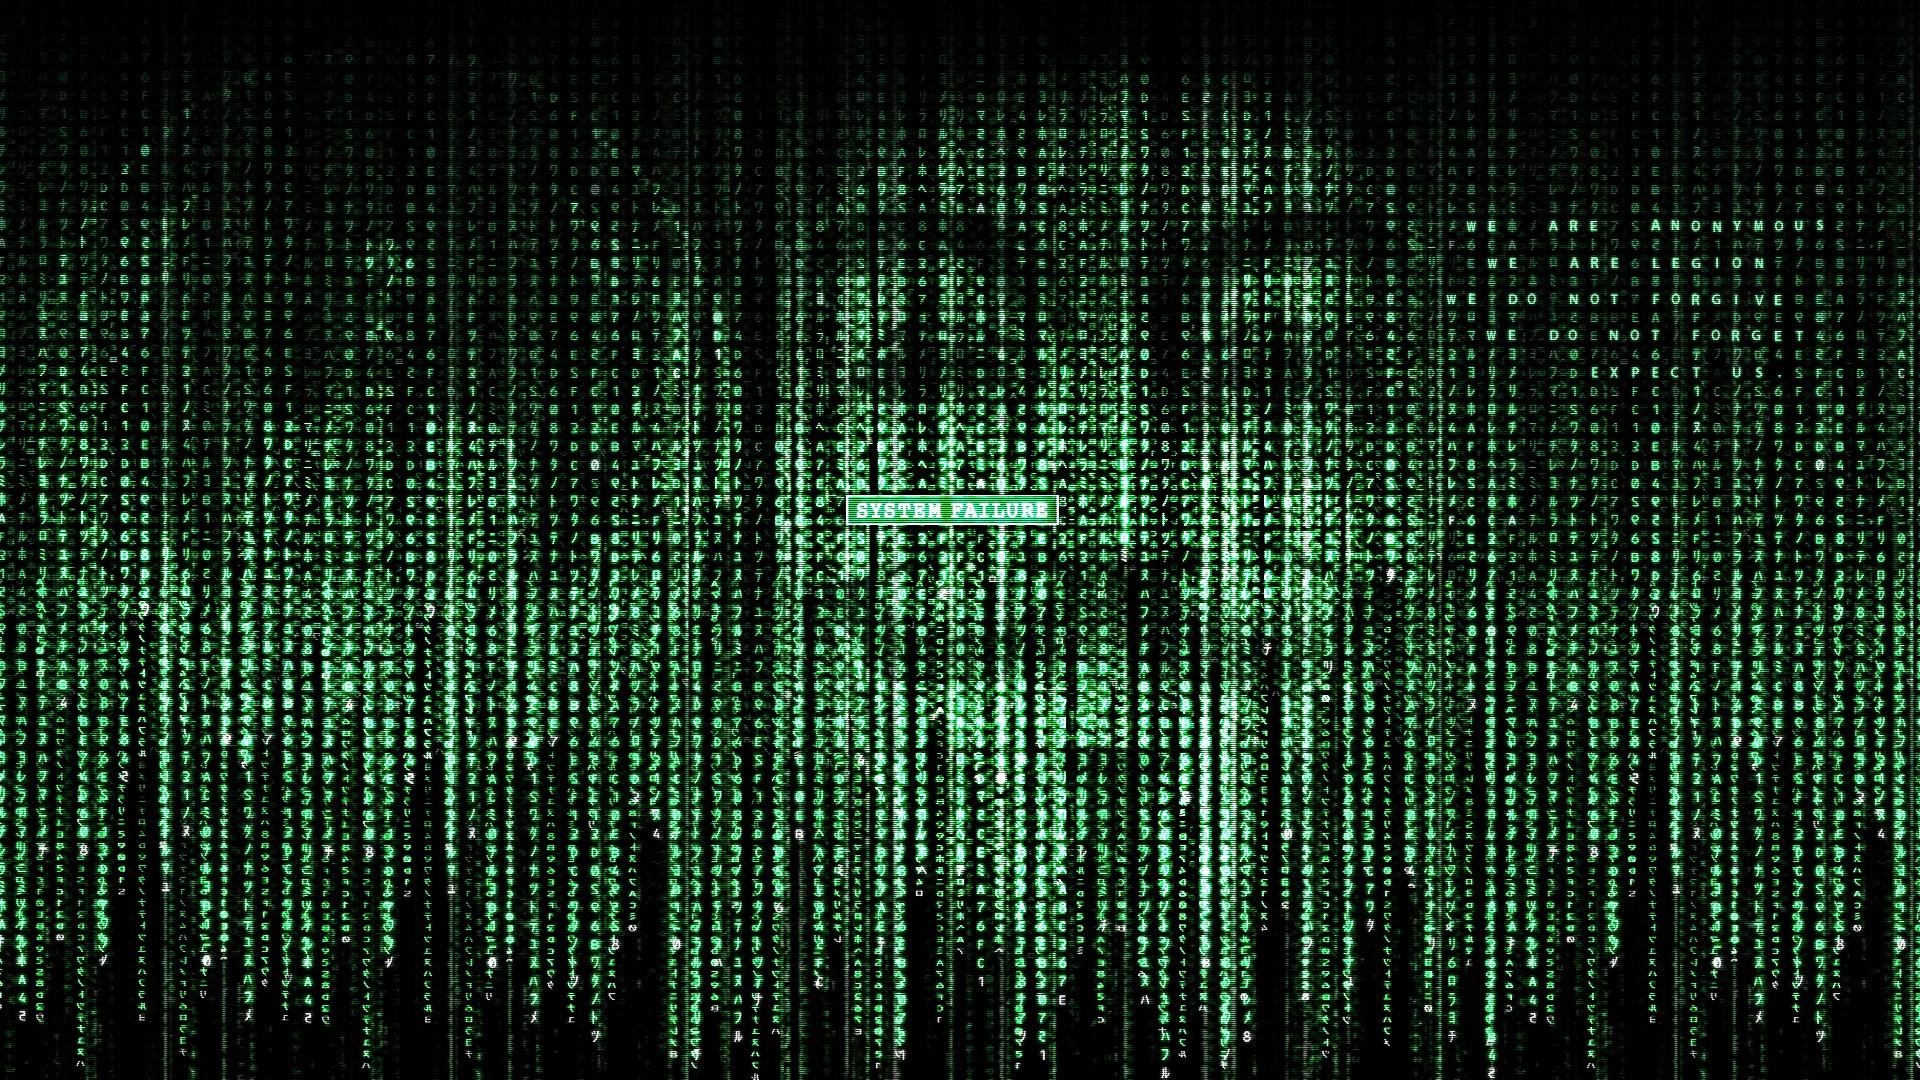 Animated Matrix Wallpaper Windows 10 (57+ images)